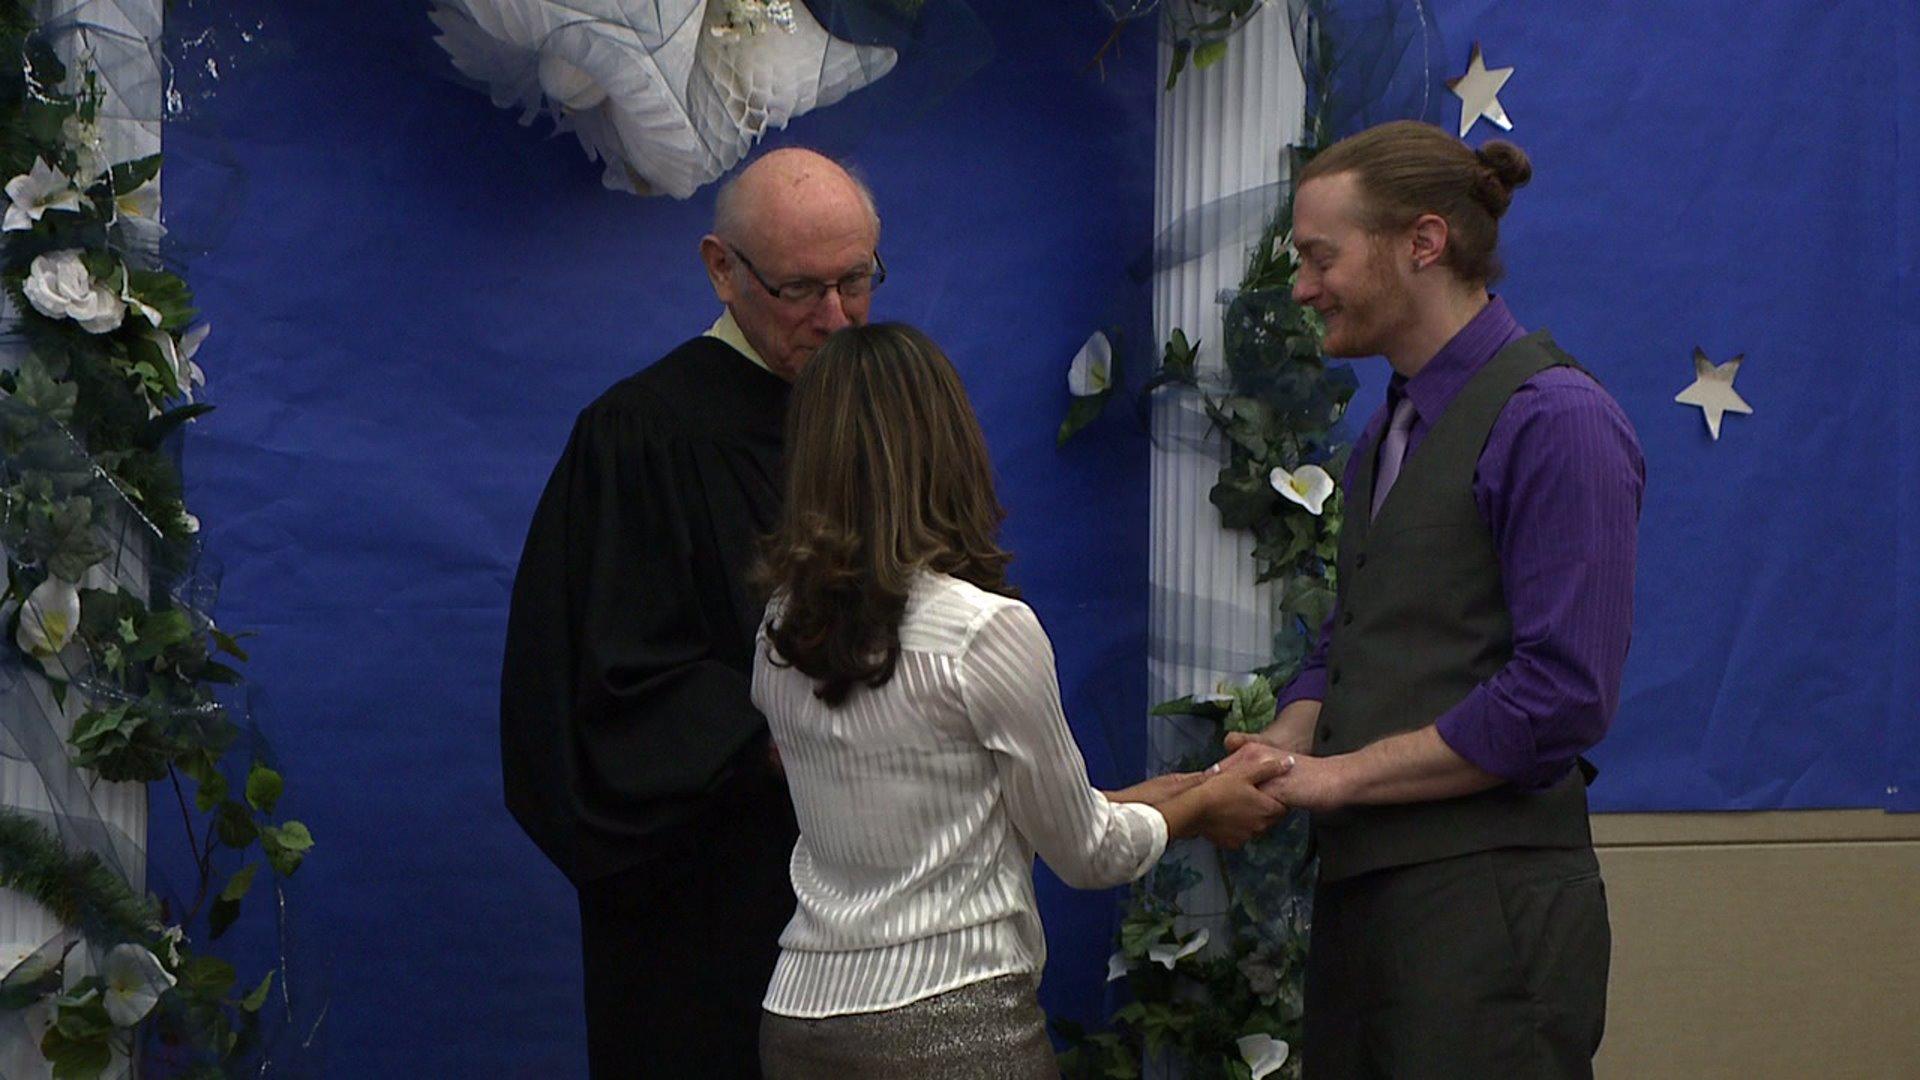 Free weddings in Denver for Valentine's